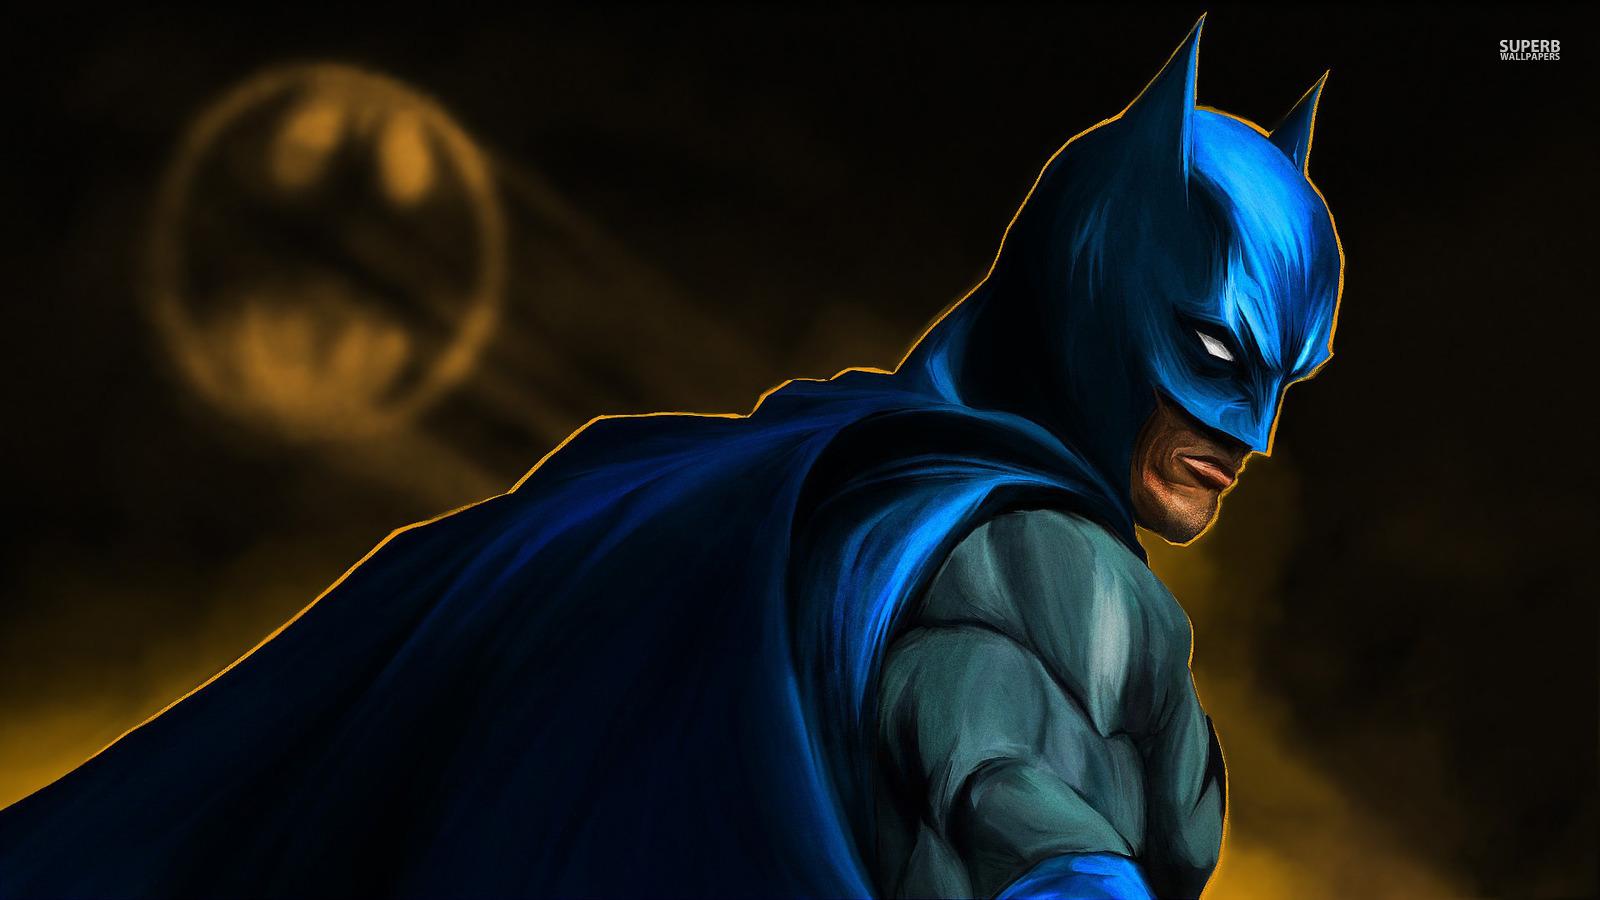 Batman batman 38689074 1600 900